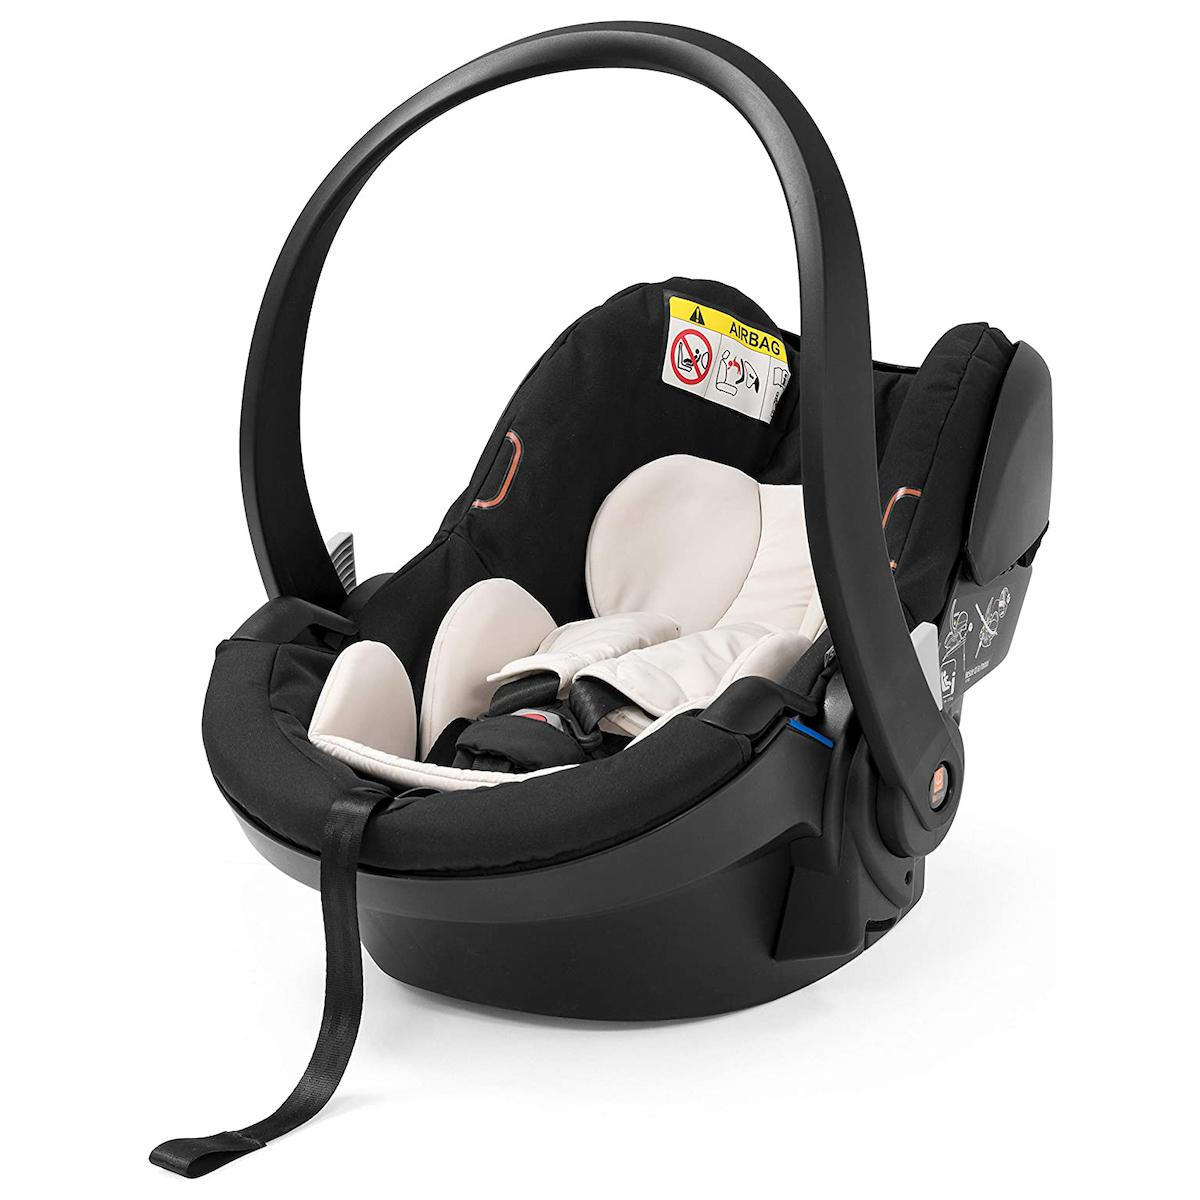 Silla auto bebé X1 capota-visera grupo 0 IZI GO Modular Stokke by BeSafe negro